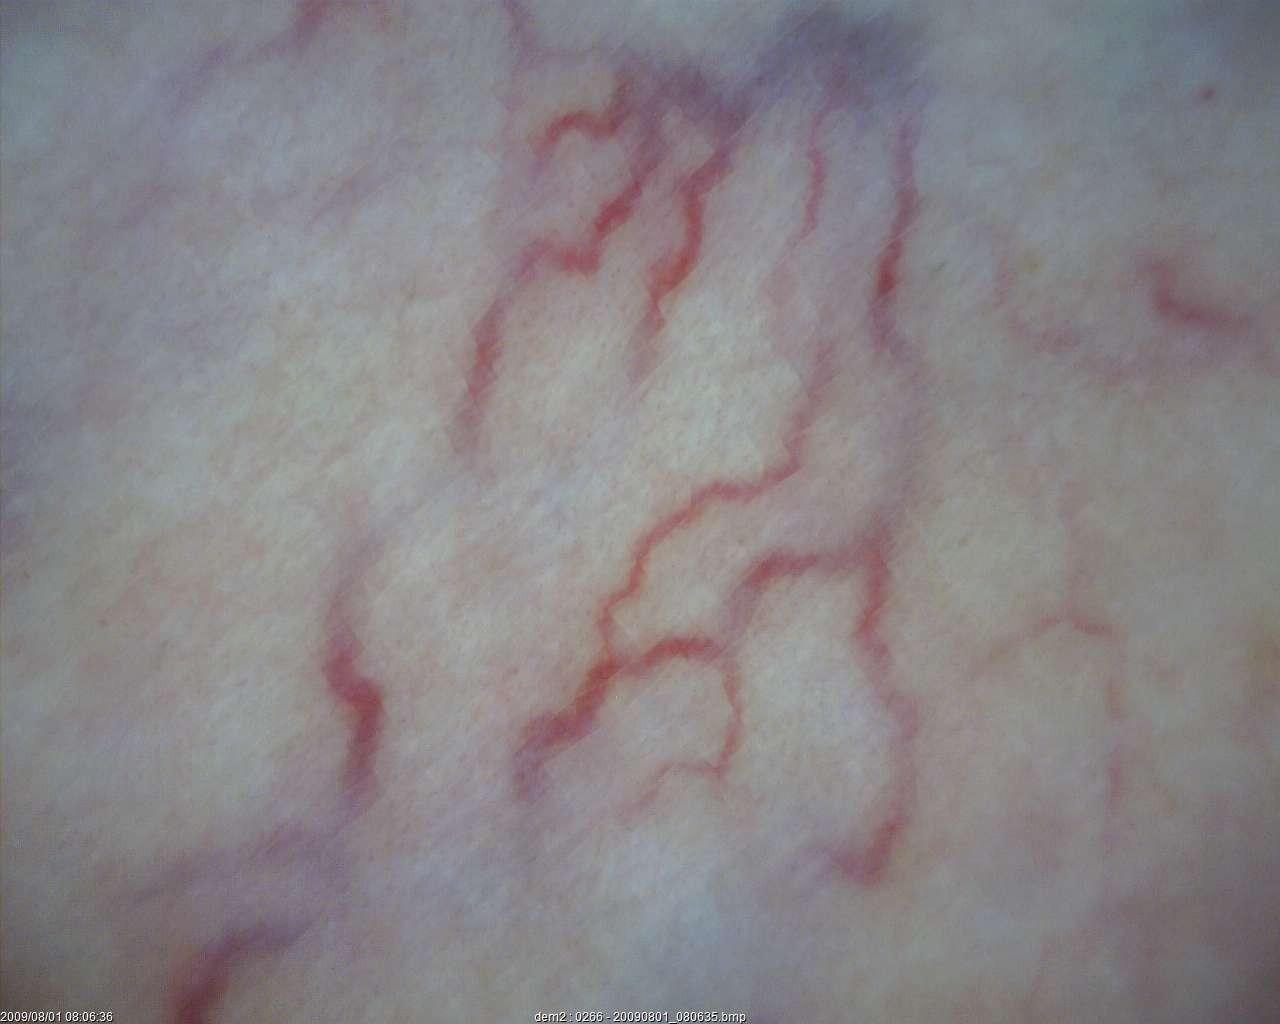 dermatology_37_1